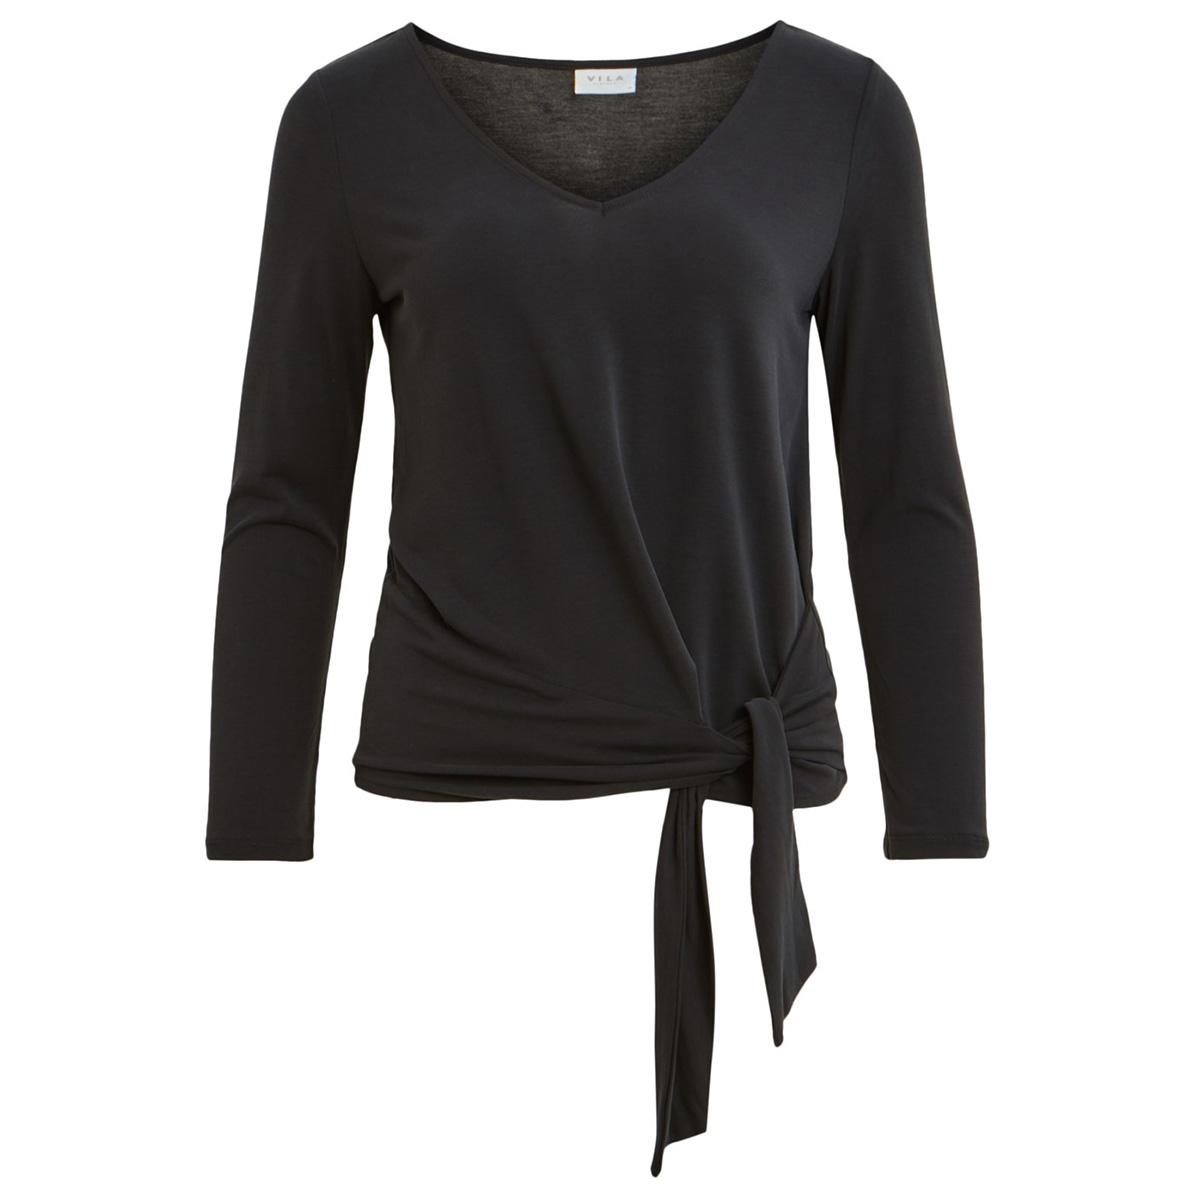 viatetsy 7/8 knot t-shirt/l 14058079 vila t-shirt black